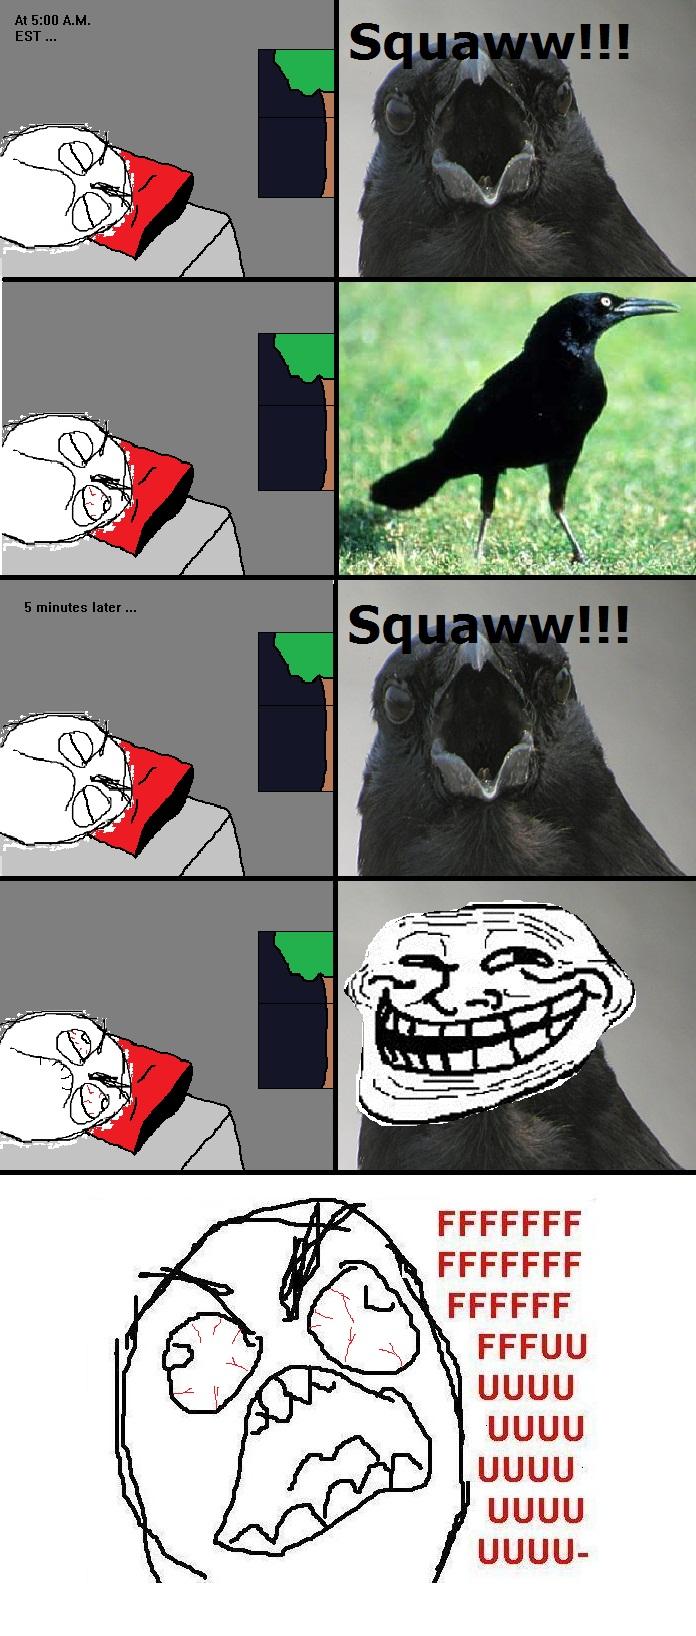 Squaww Squaww!!! TrollFace